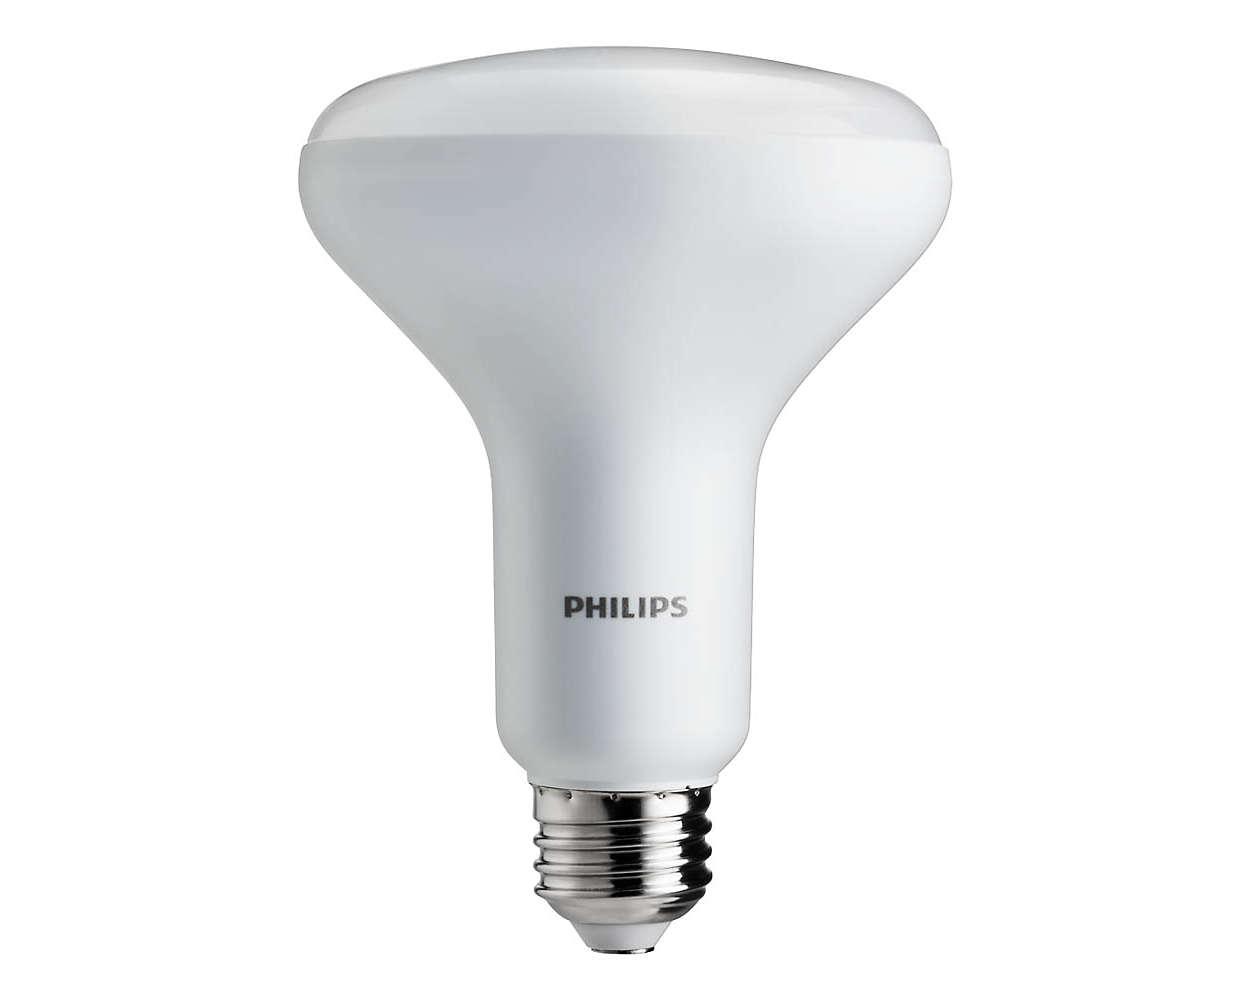 LED Reflector 046677459550 | Philips